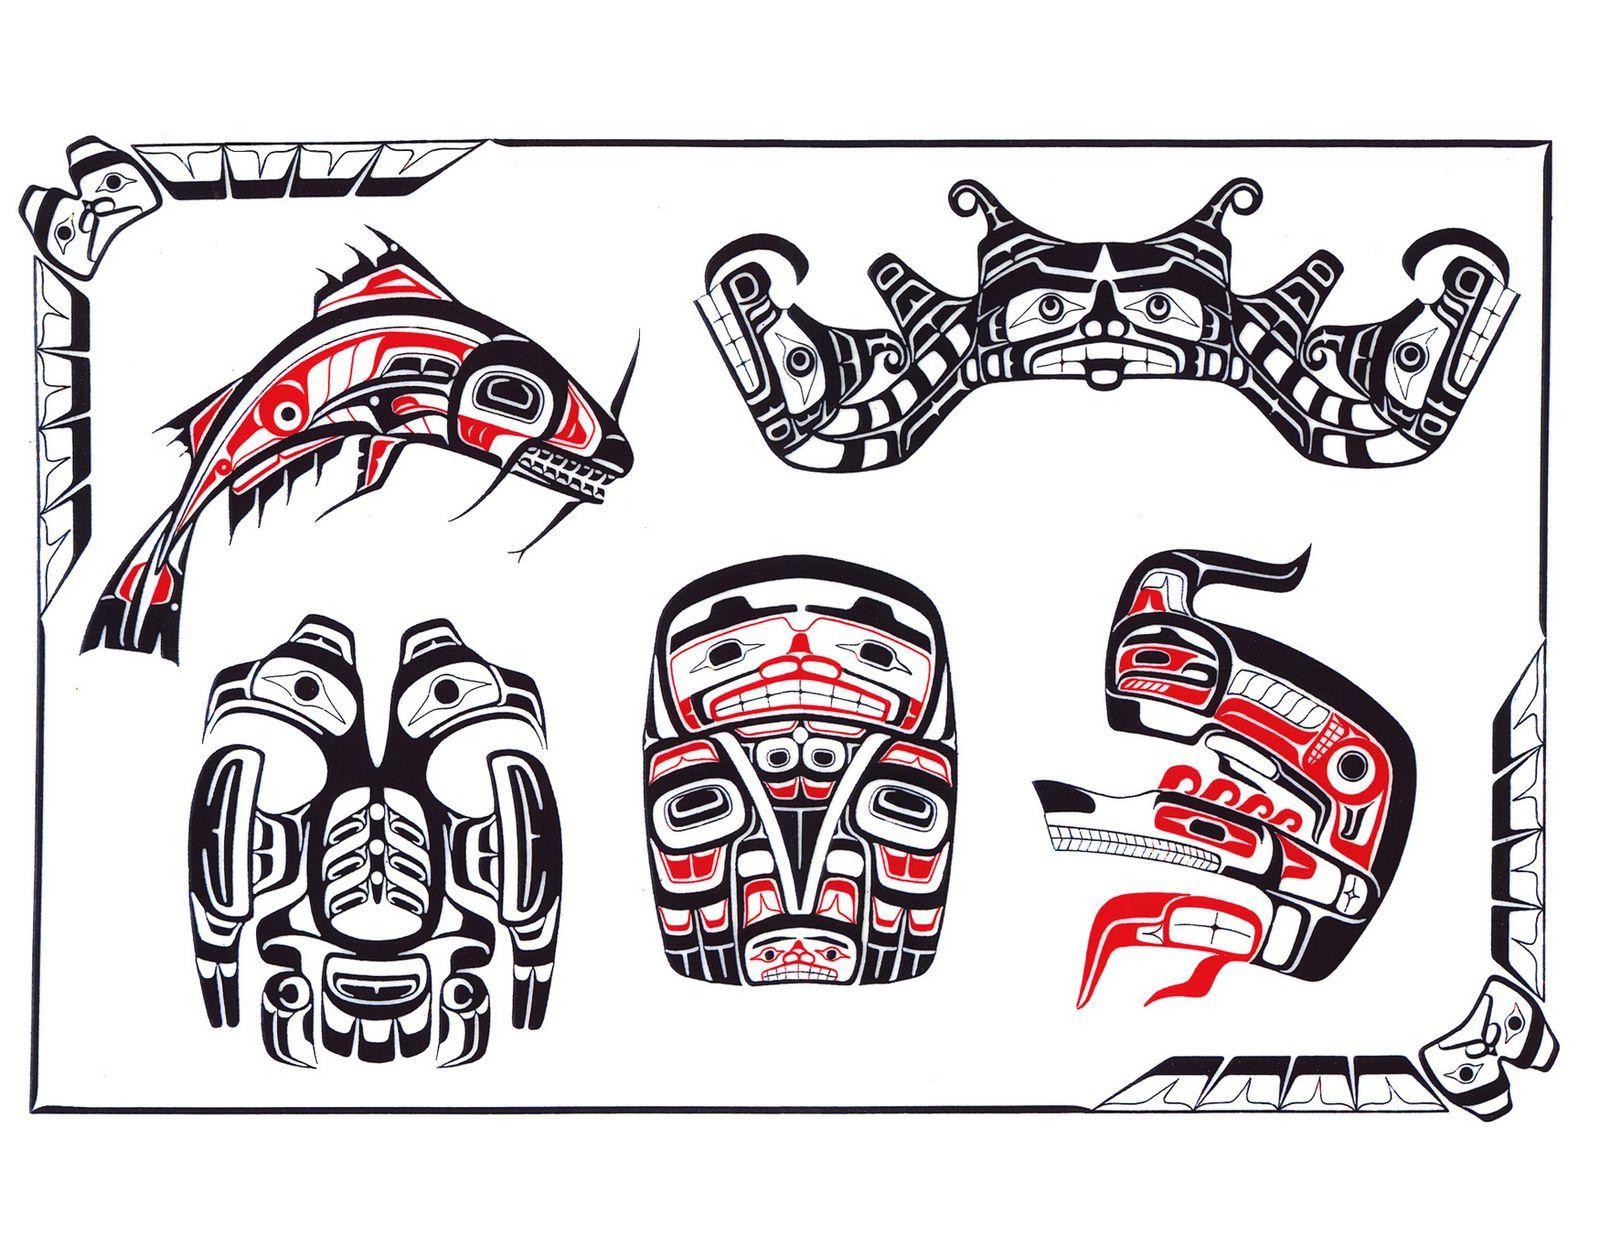 70 best tattoo images on pinterest aboriginal art native art and indian tattoo symbols hada googlom biocorpaavc Choice Image